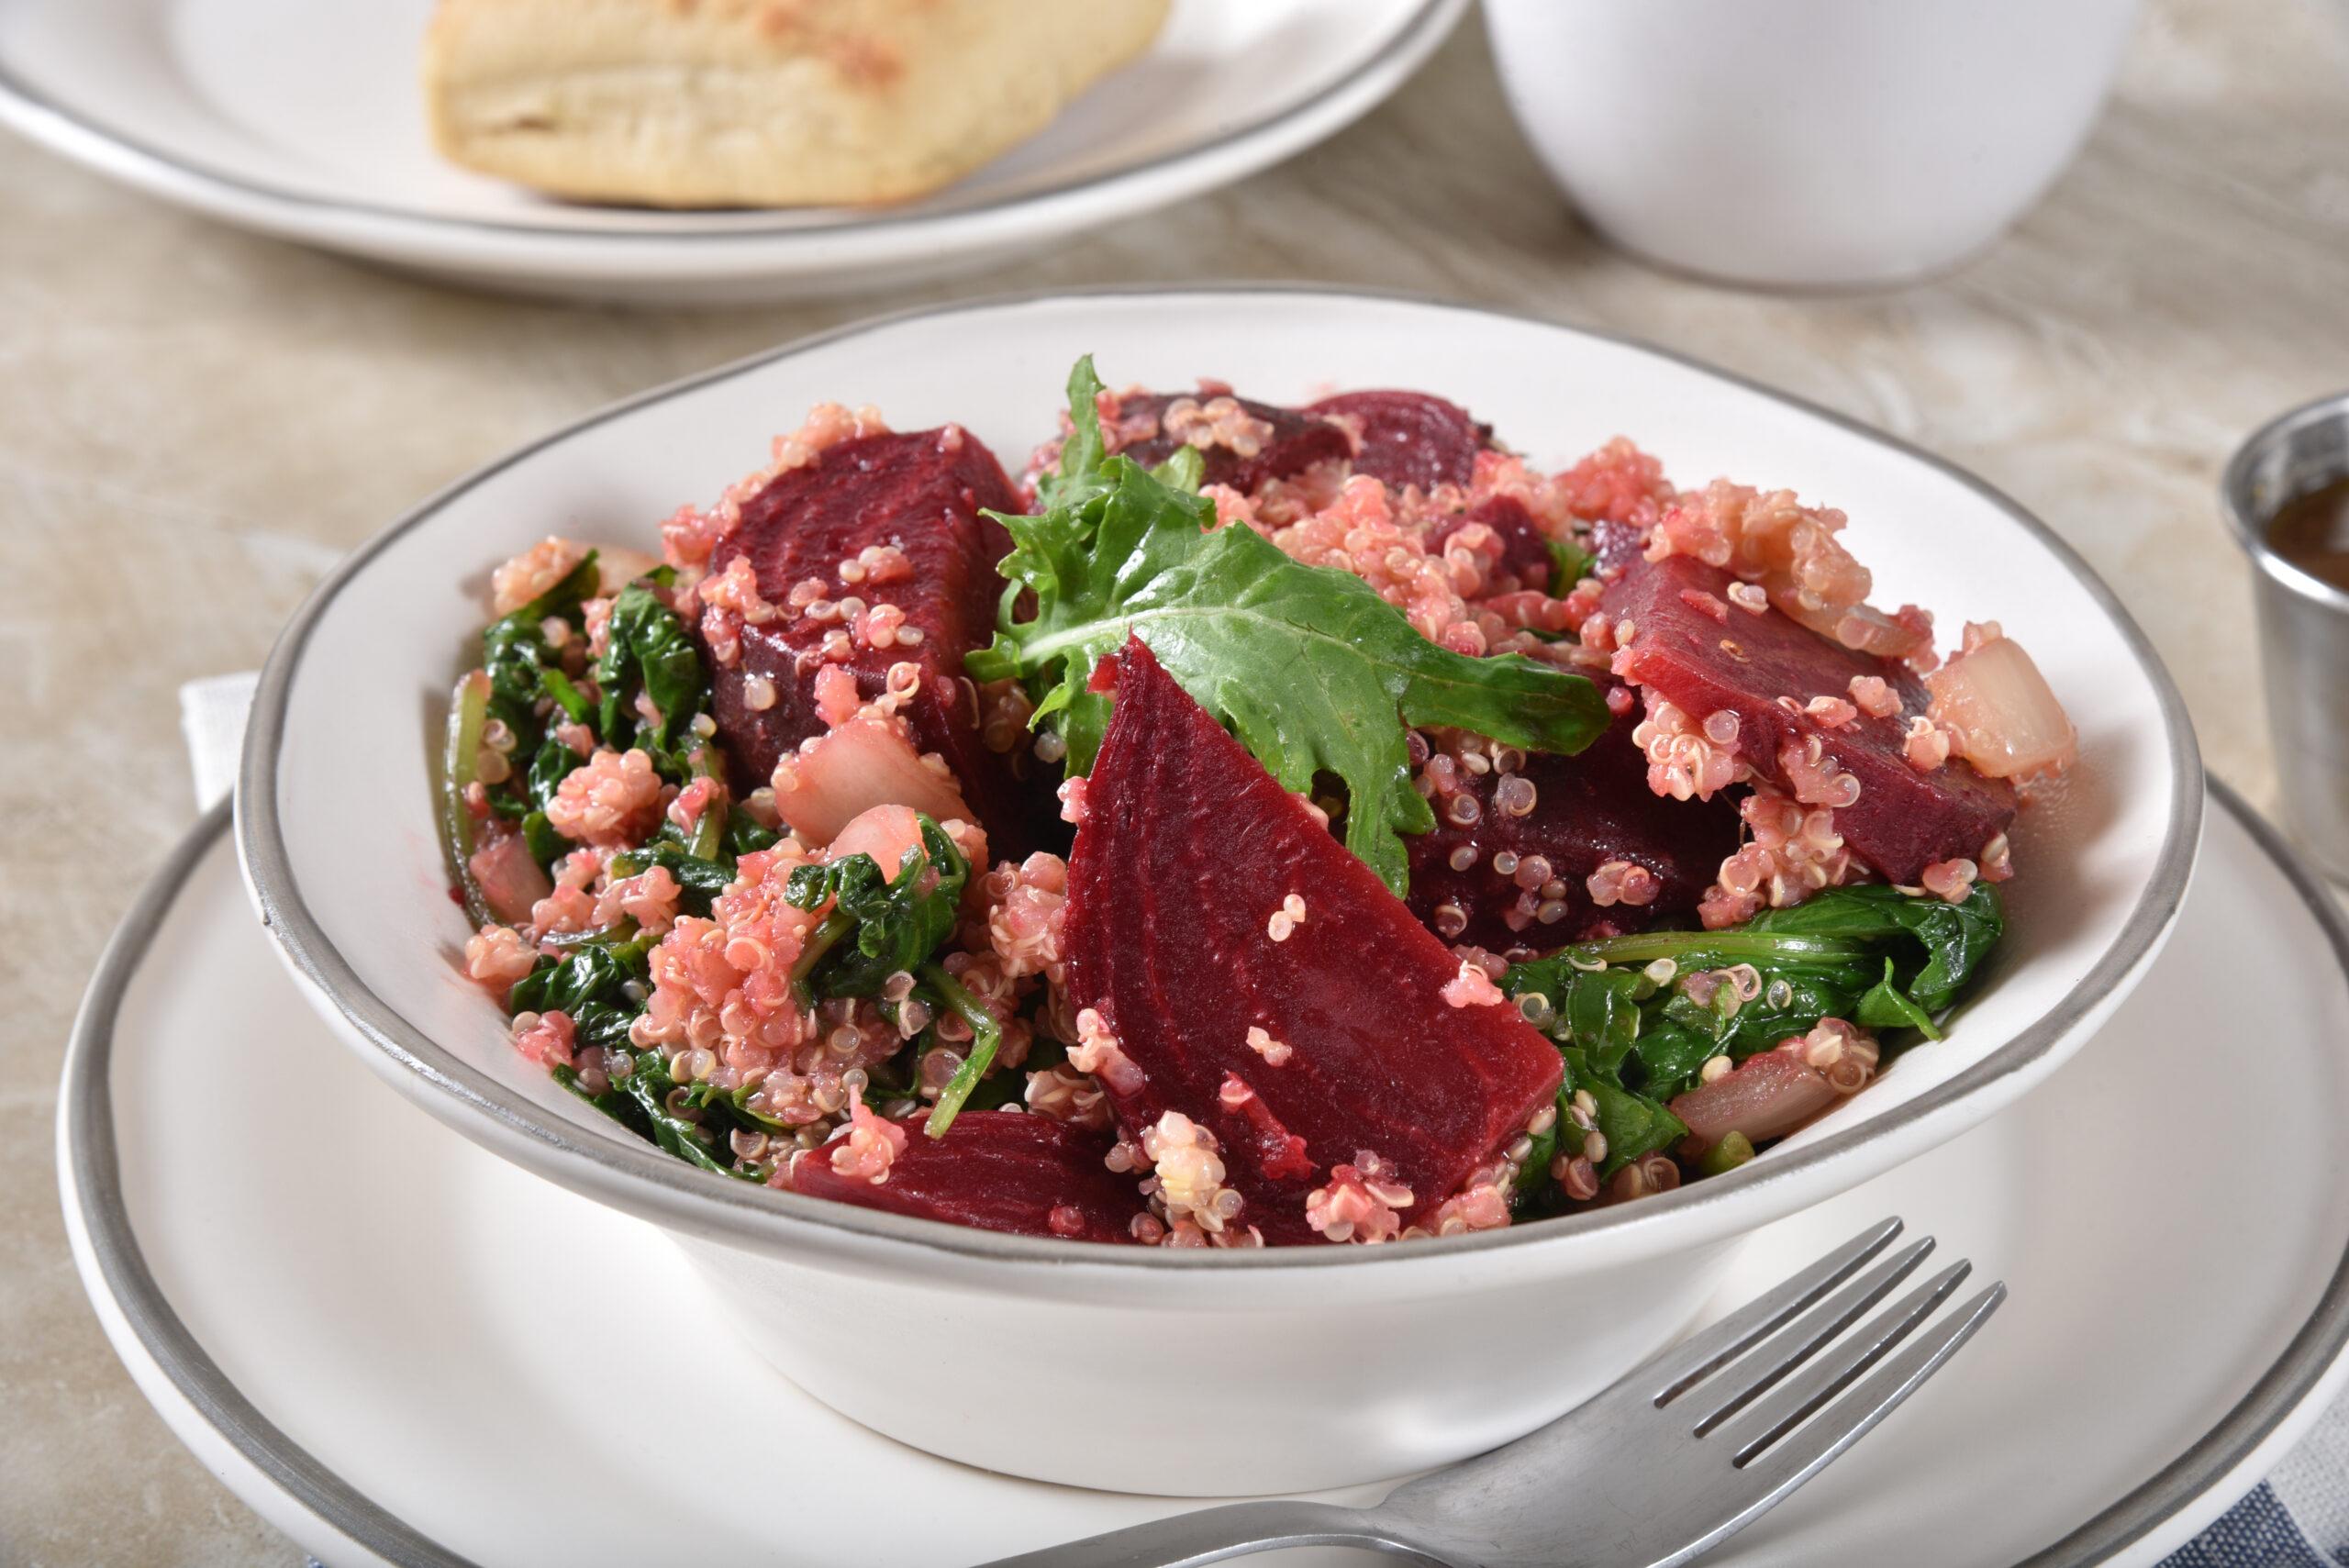 Beet, Kale and Quinoa Salad